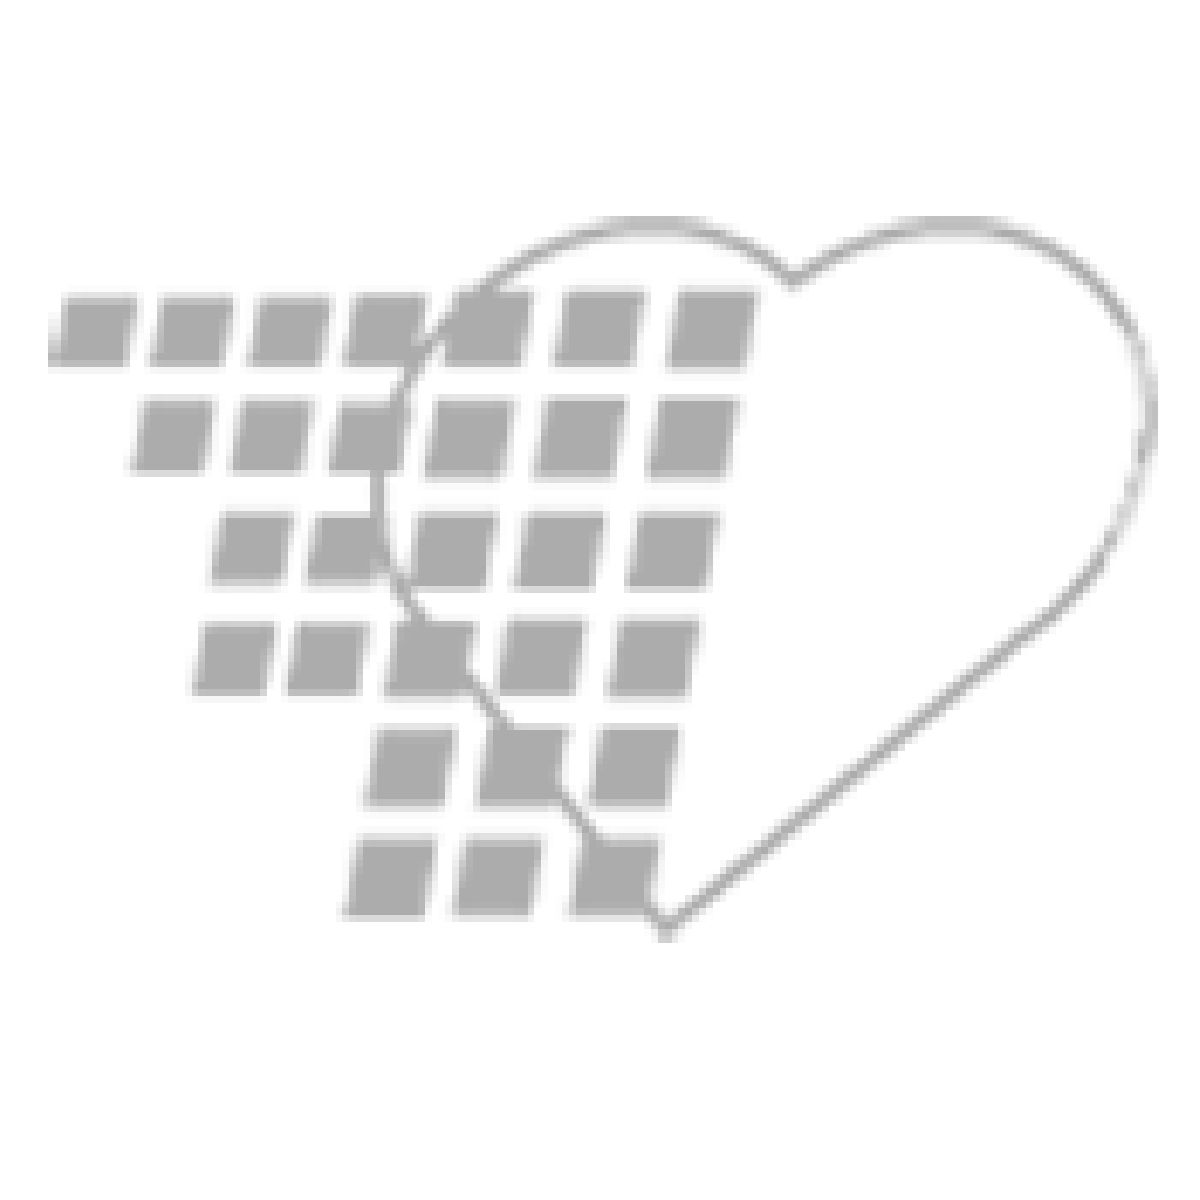 07-71-2142 Argyle™ Suction Catheter Tray with Sterile Saline - 14 Fr (24/Case)